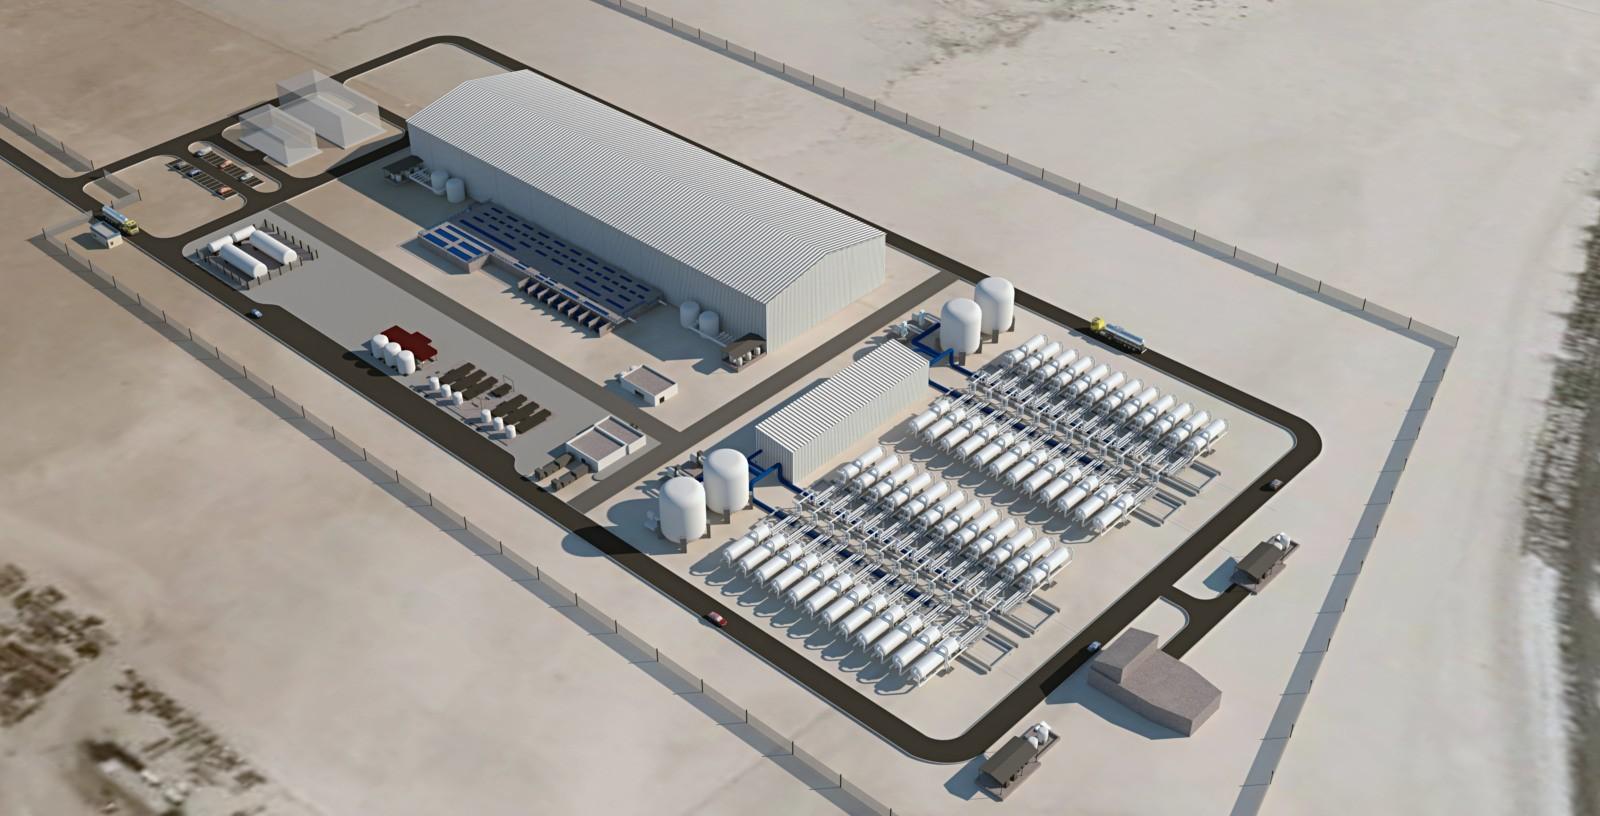 Rabigh_3_Desalination-Plant_Saudi-Arabia_SEPCOIII_IDOM_2